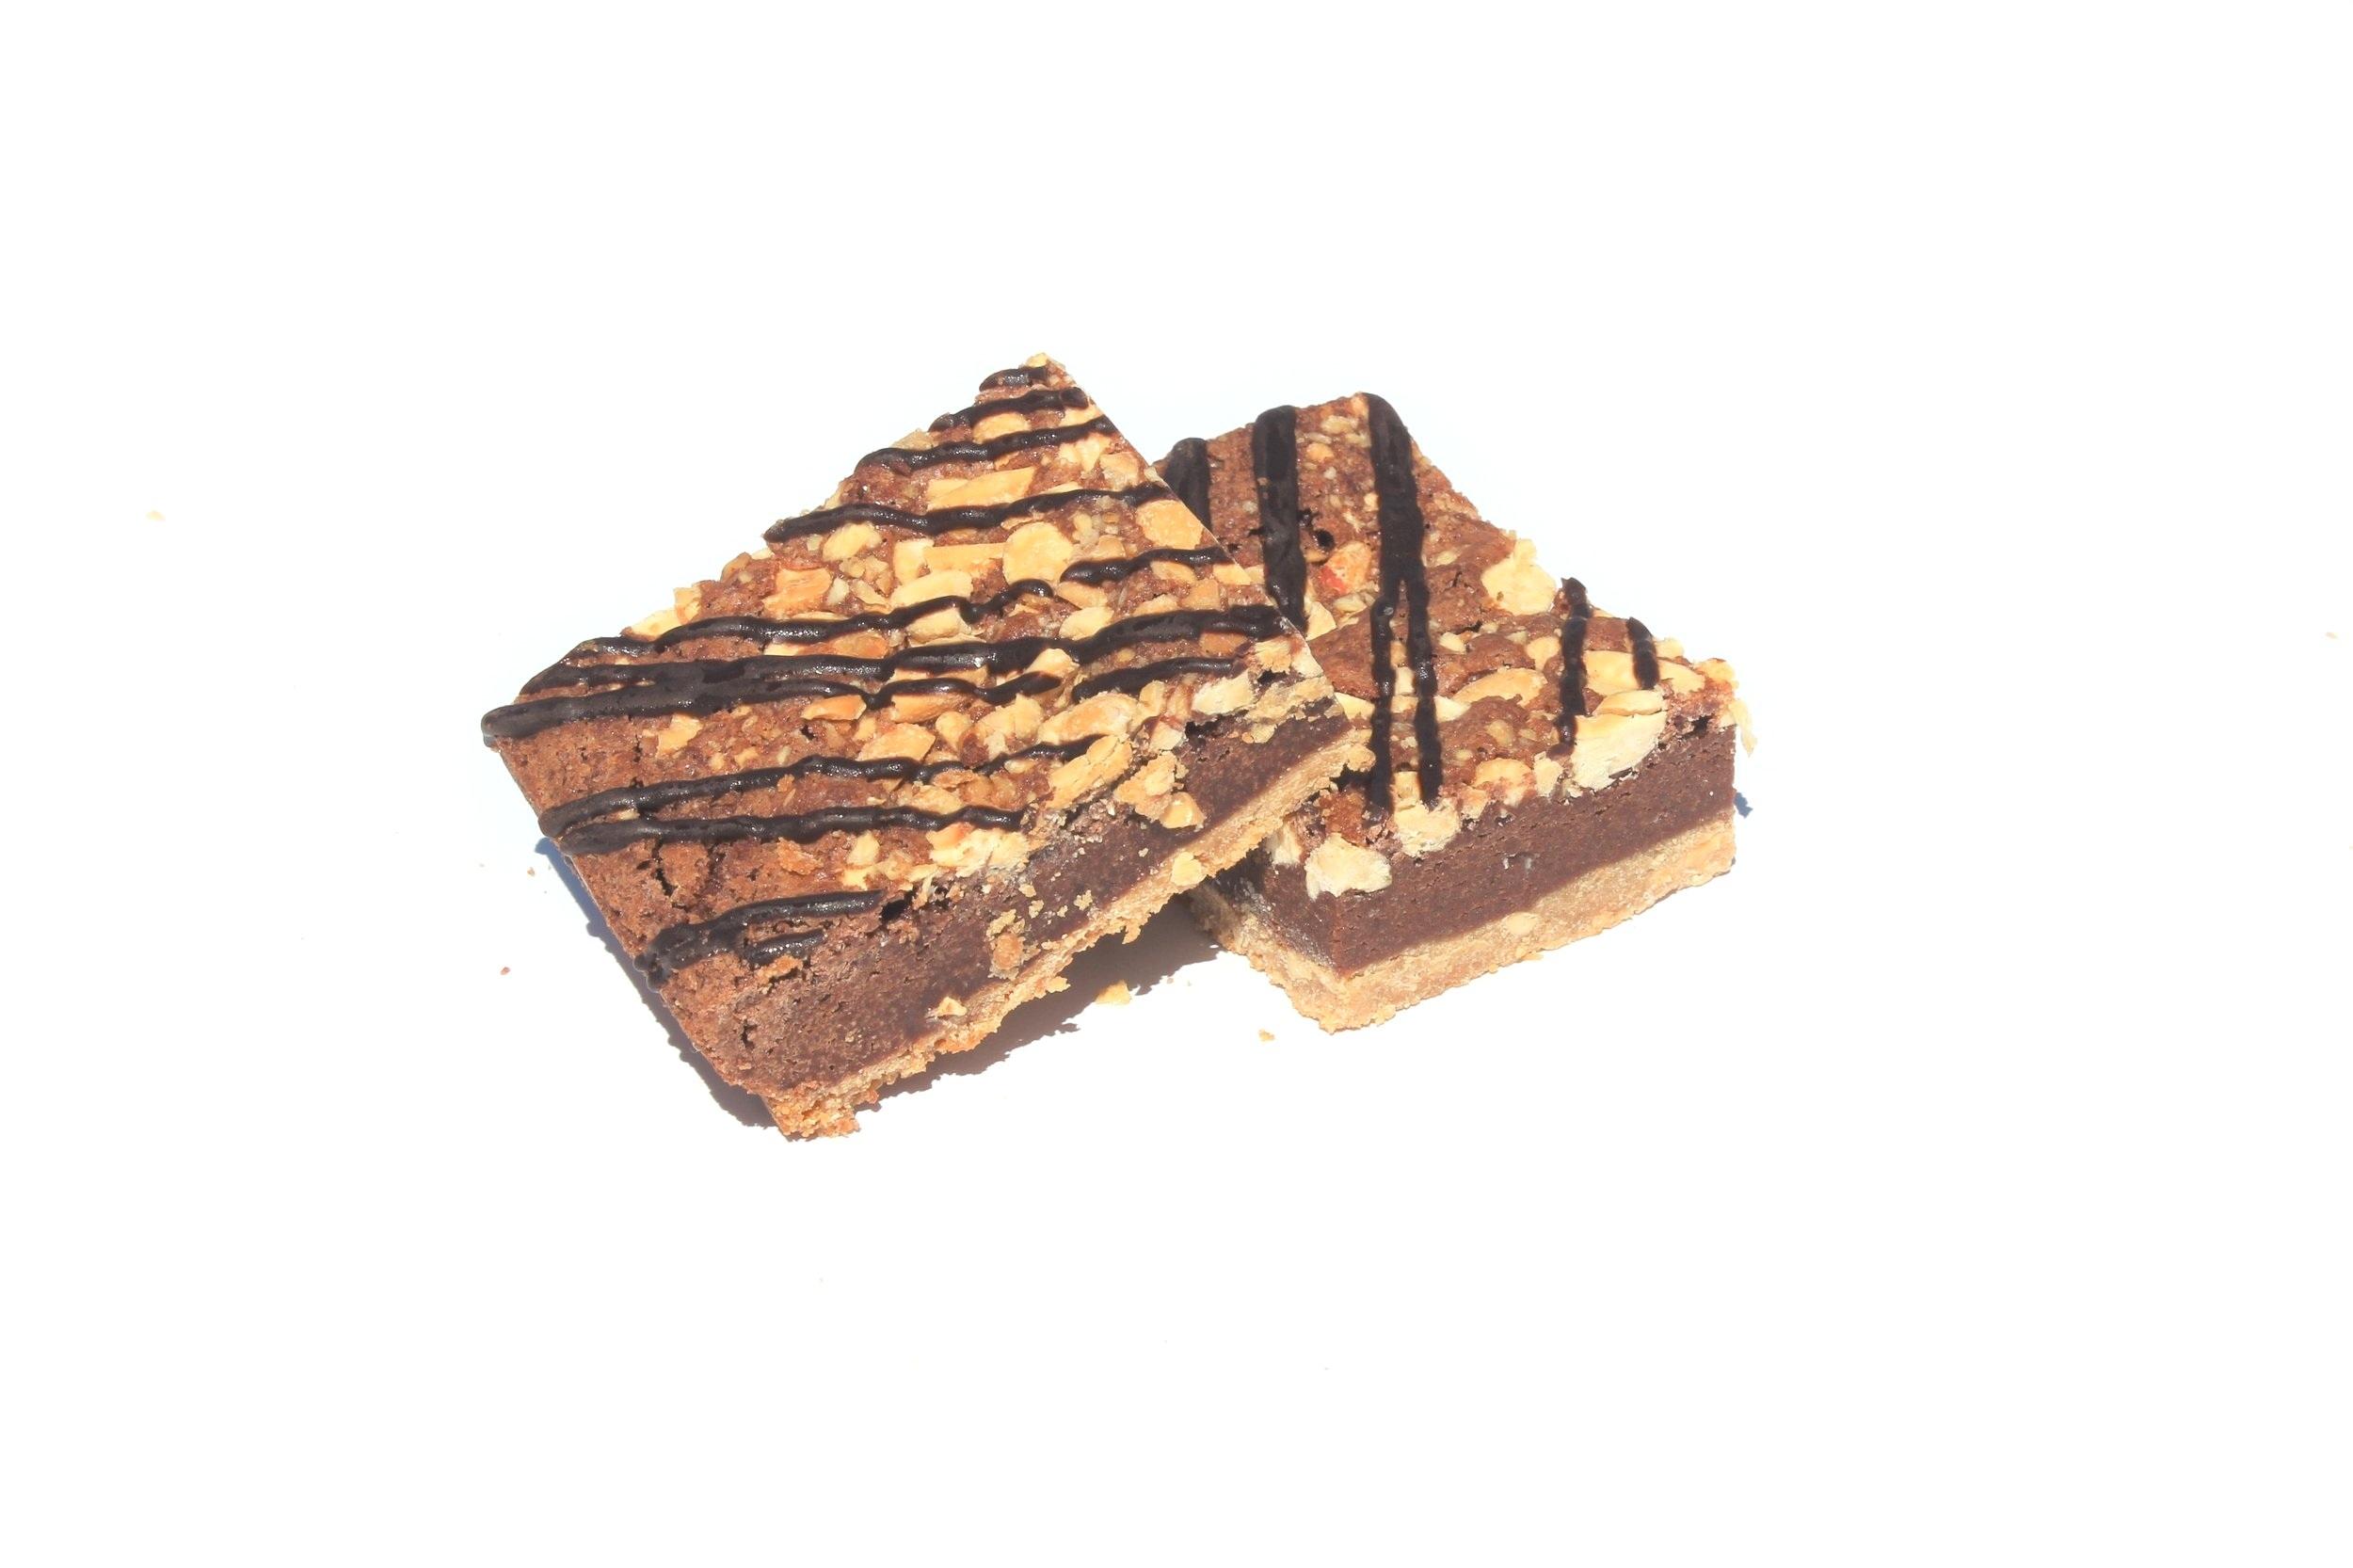 Wheat Free Peanut Butter Chocolate Bar